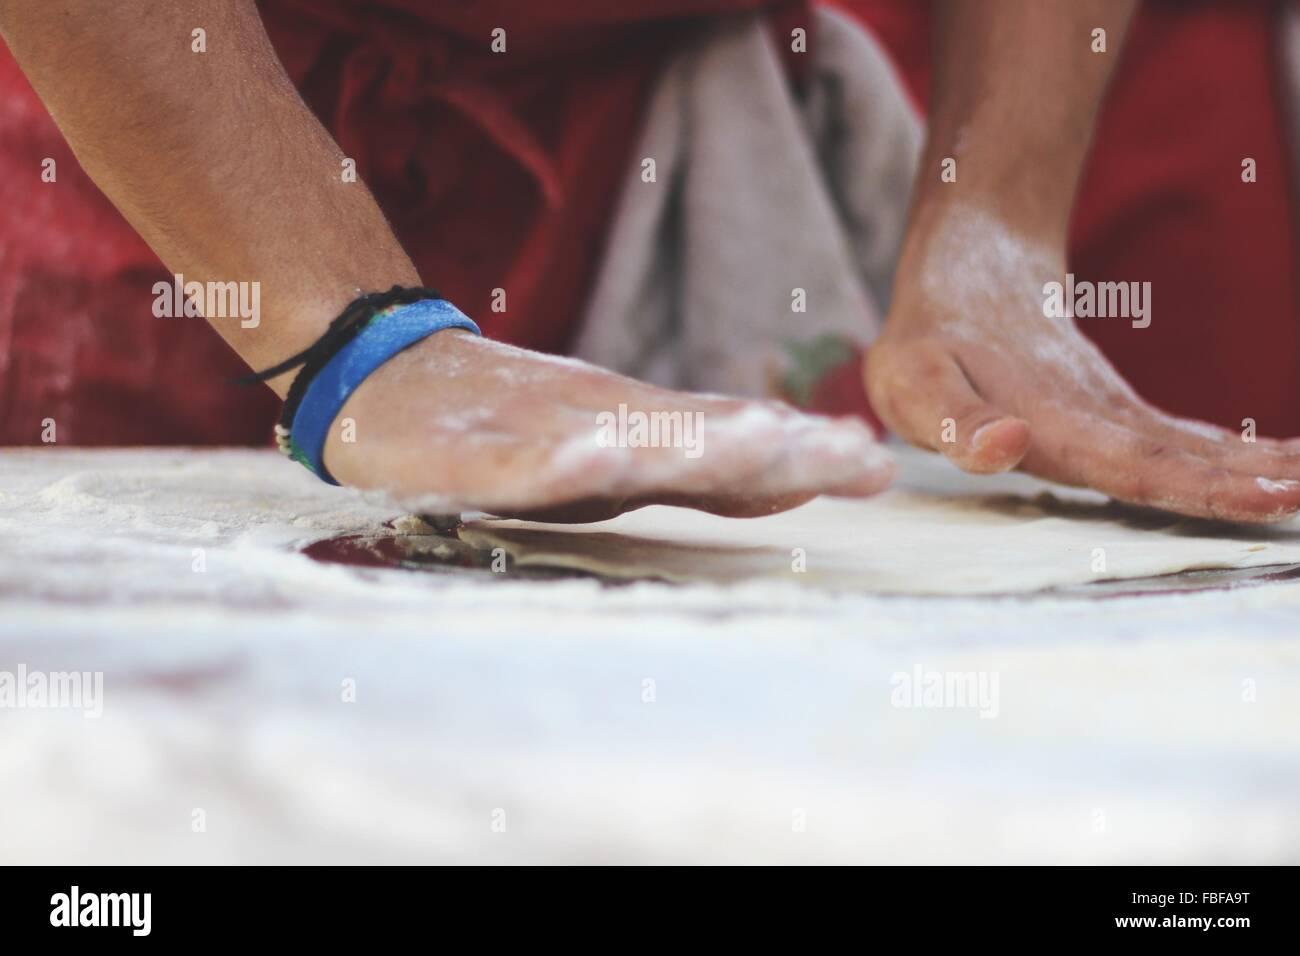 Imagen recortada del hombre amasar masa cocina comercial Imagen De Stock